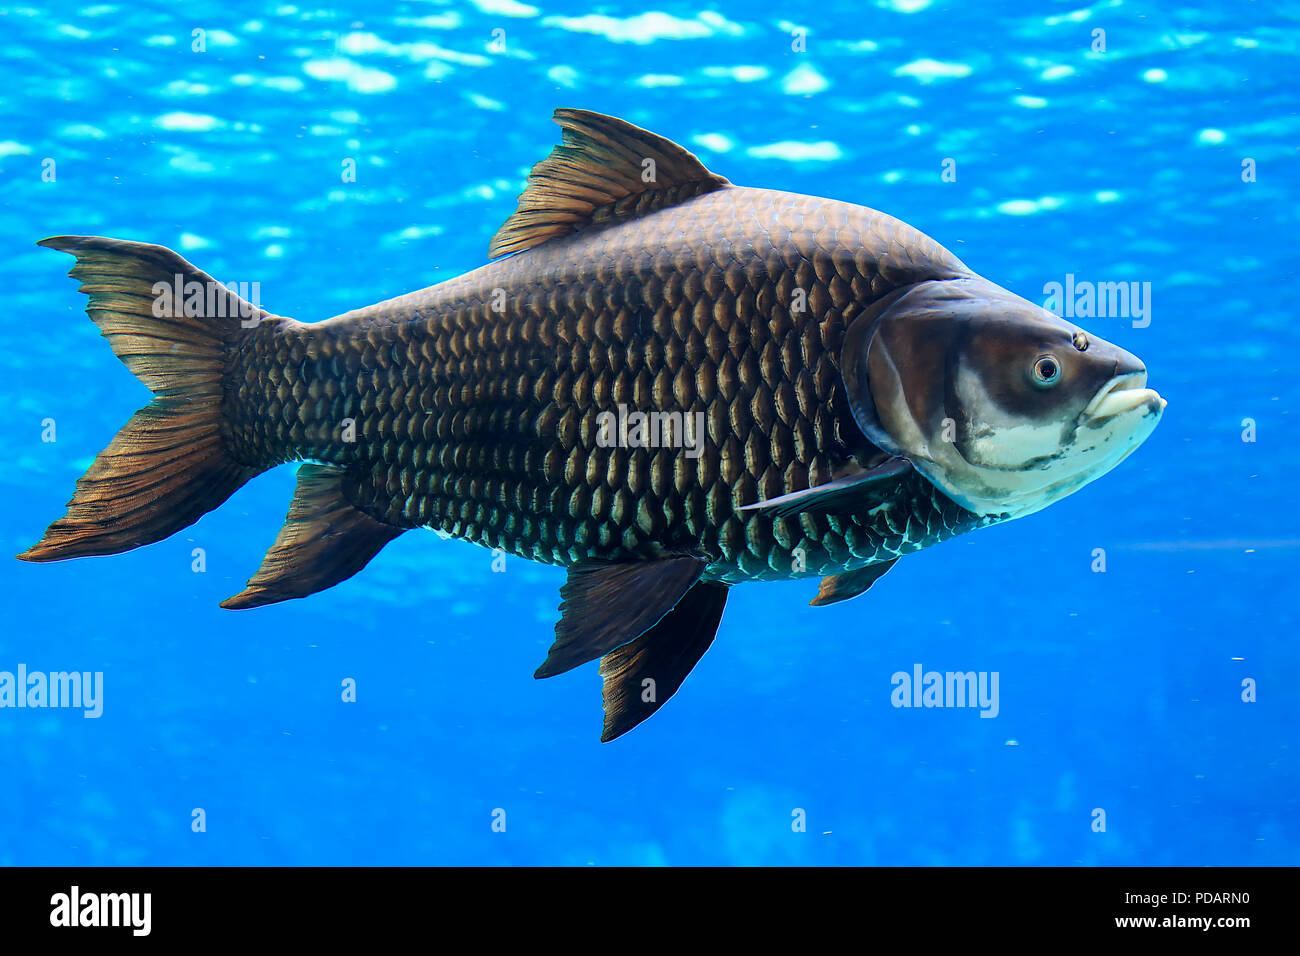 Giant barb, Siamese giant carp, captive, Singapore, Asia, Catlocarpio siamensis - Stock Image